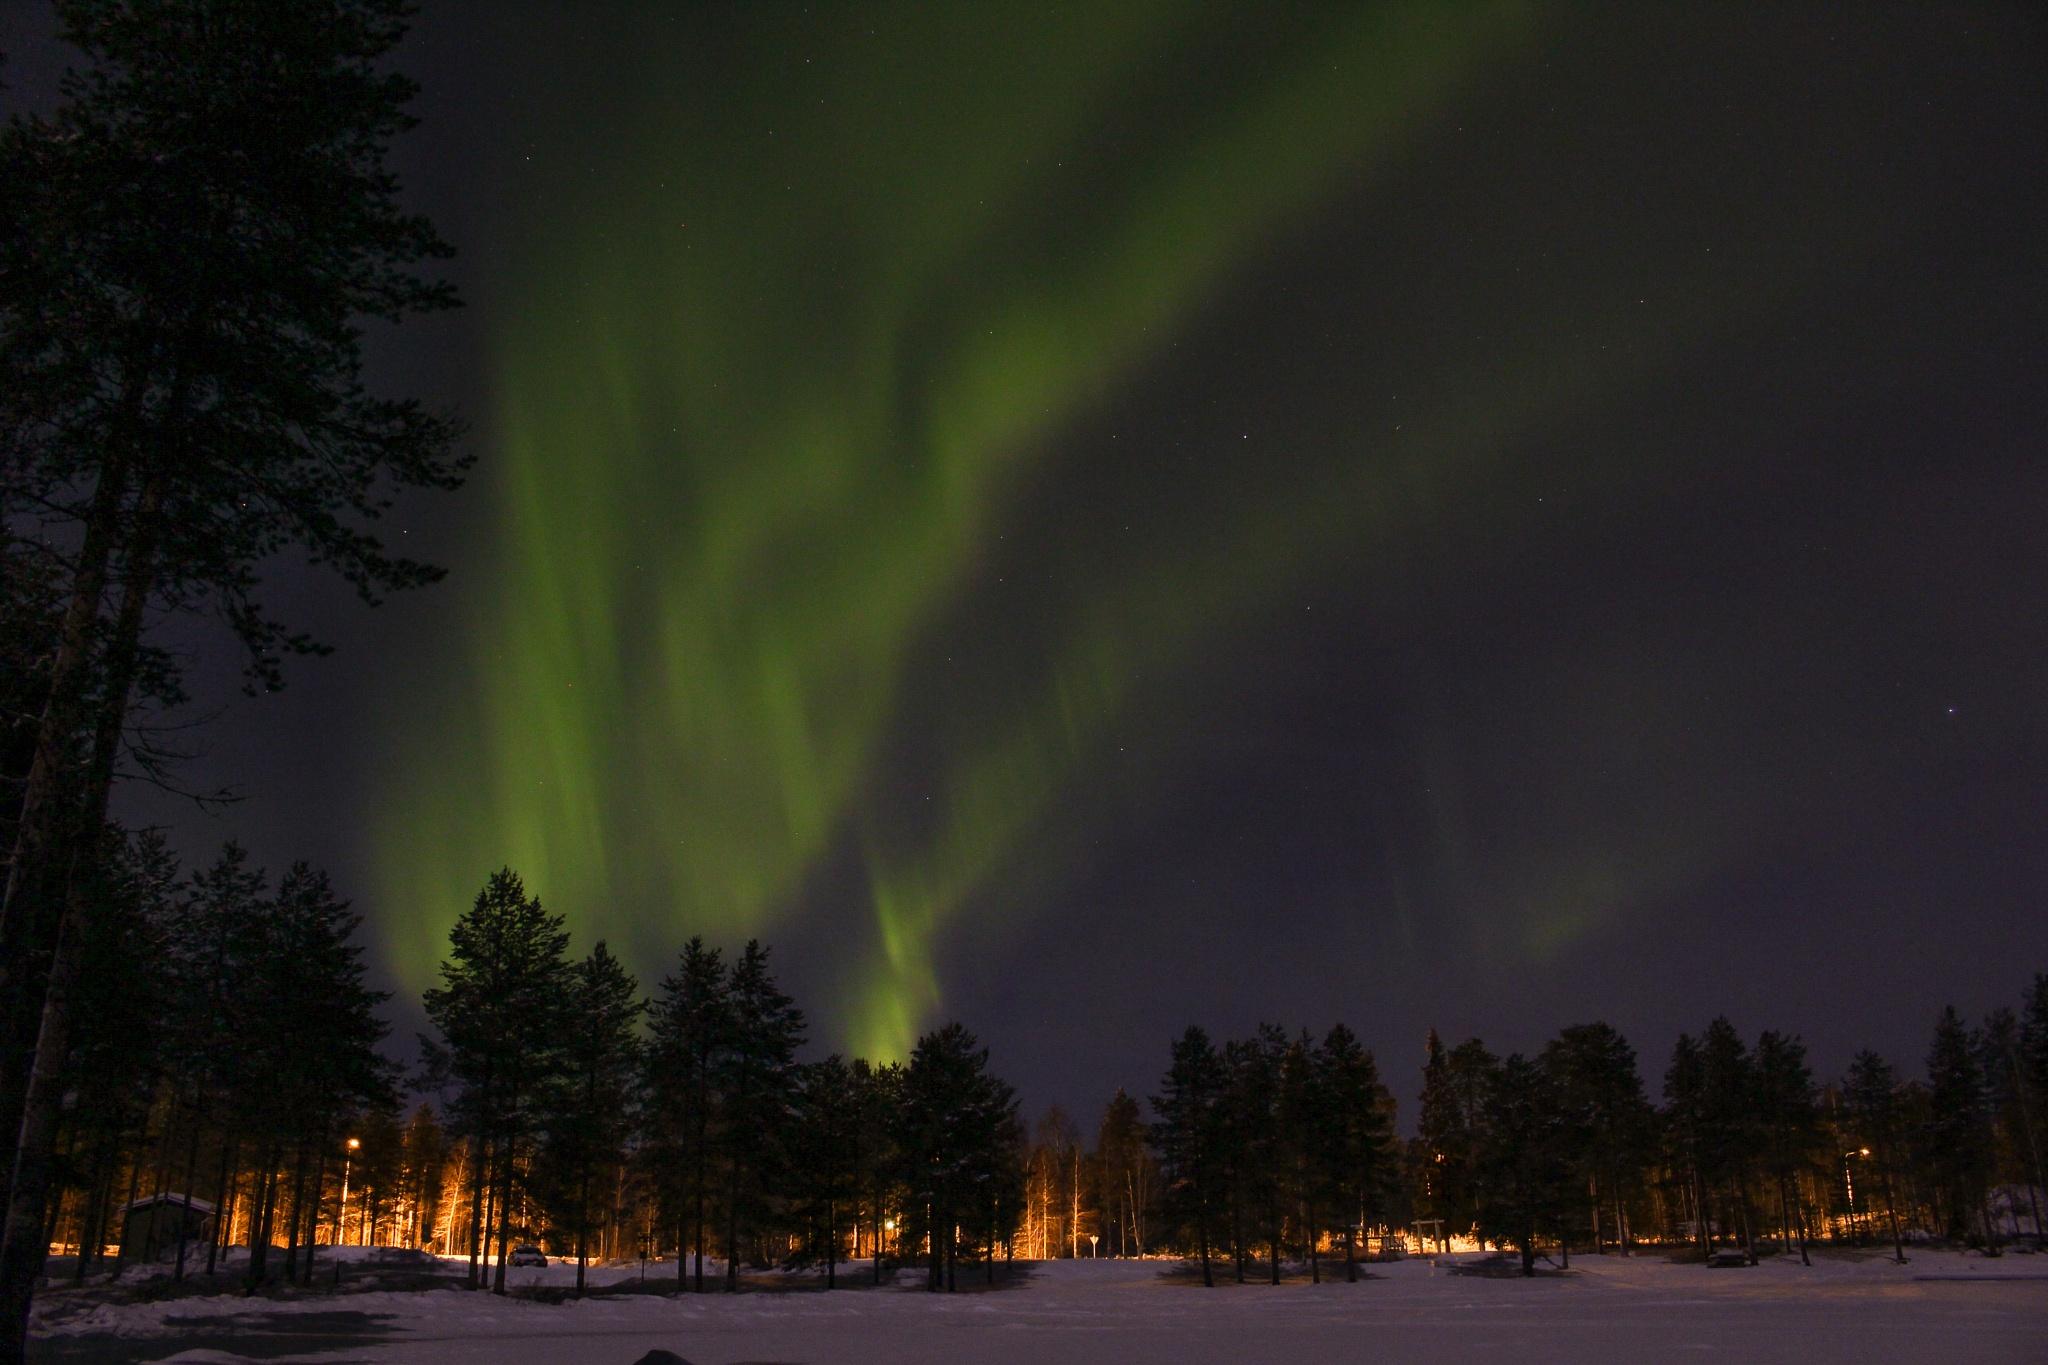 aurora borealis by Roope Takarautio